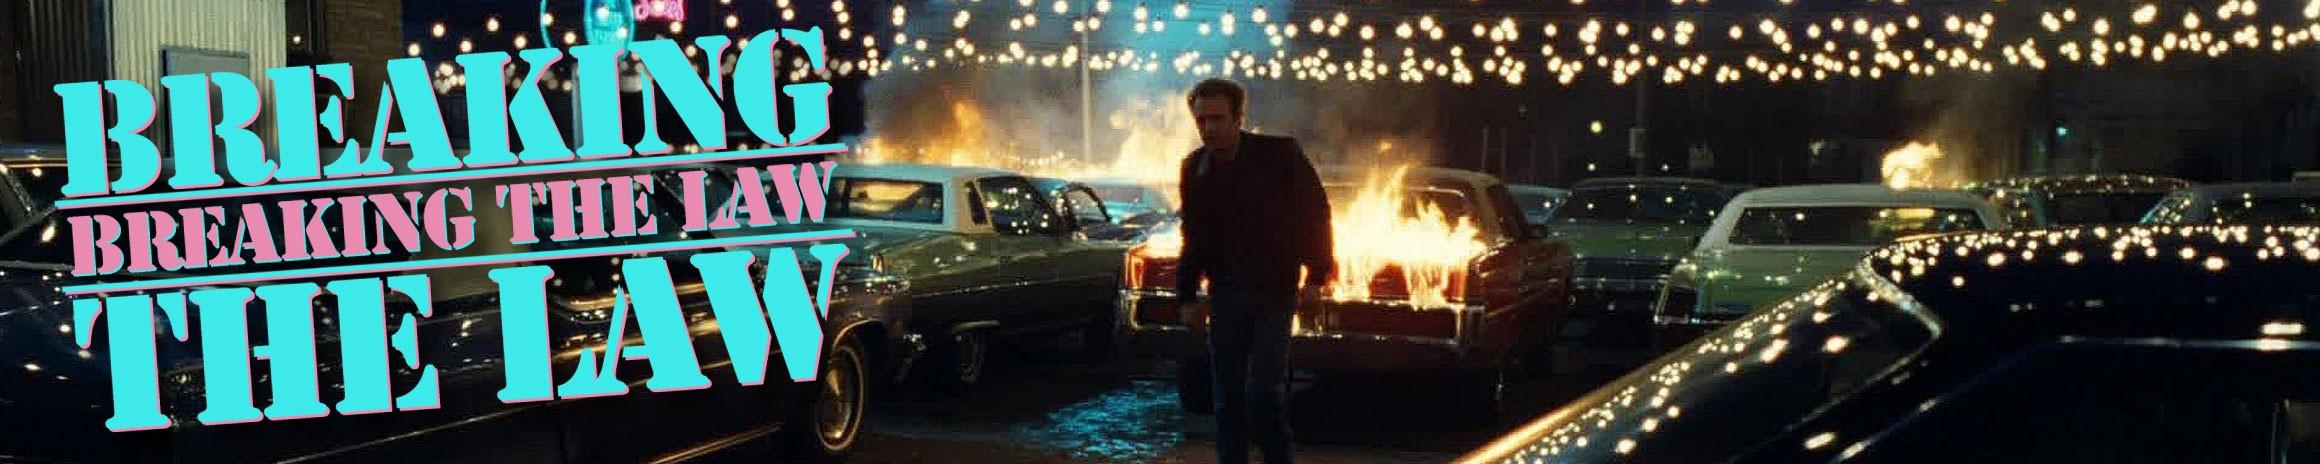 BREAKING THE LAW, BREAKING THE LAW - a season of CRIME films